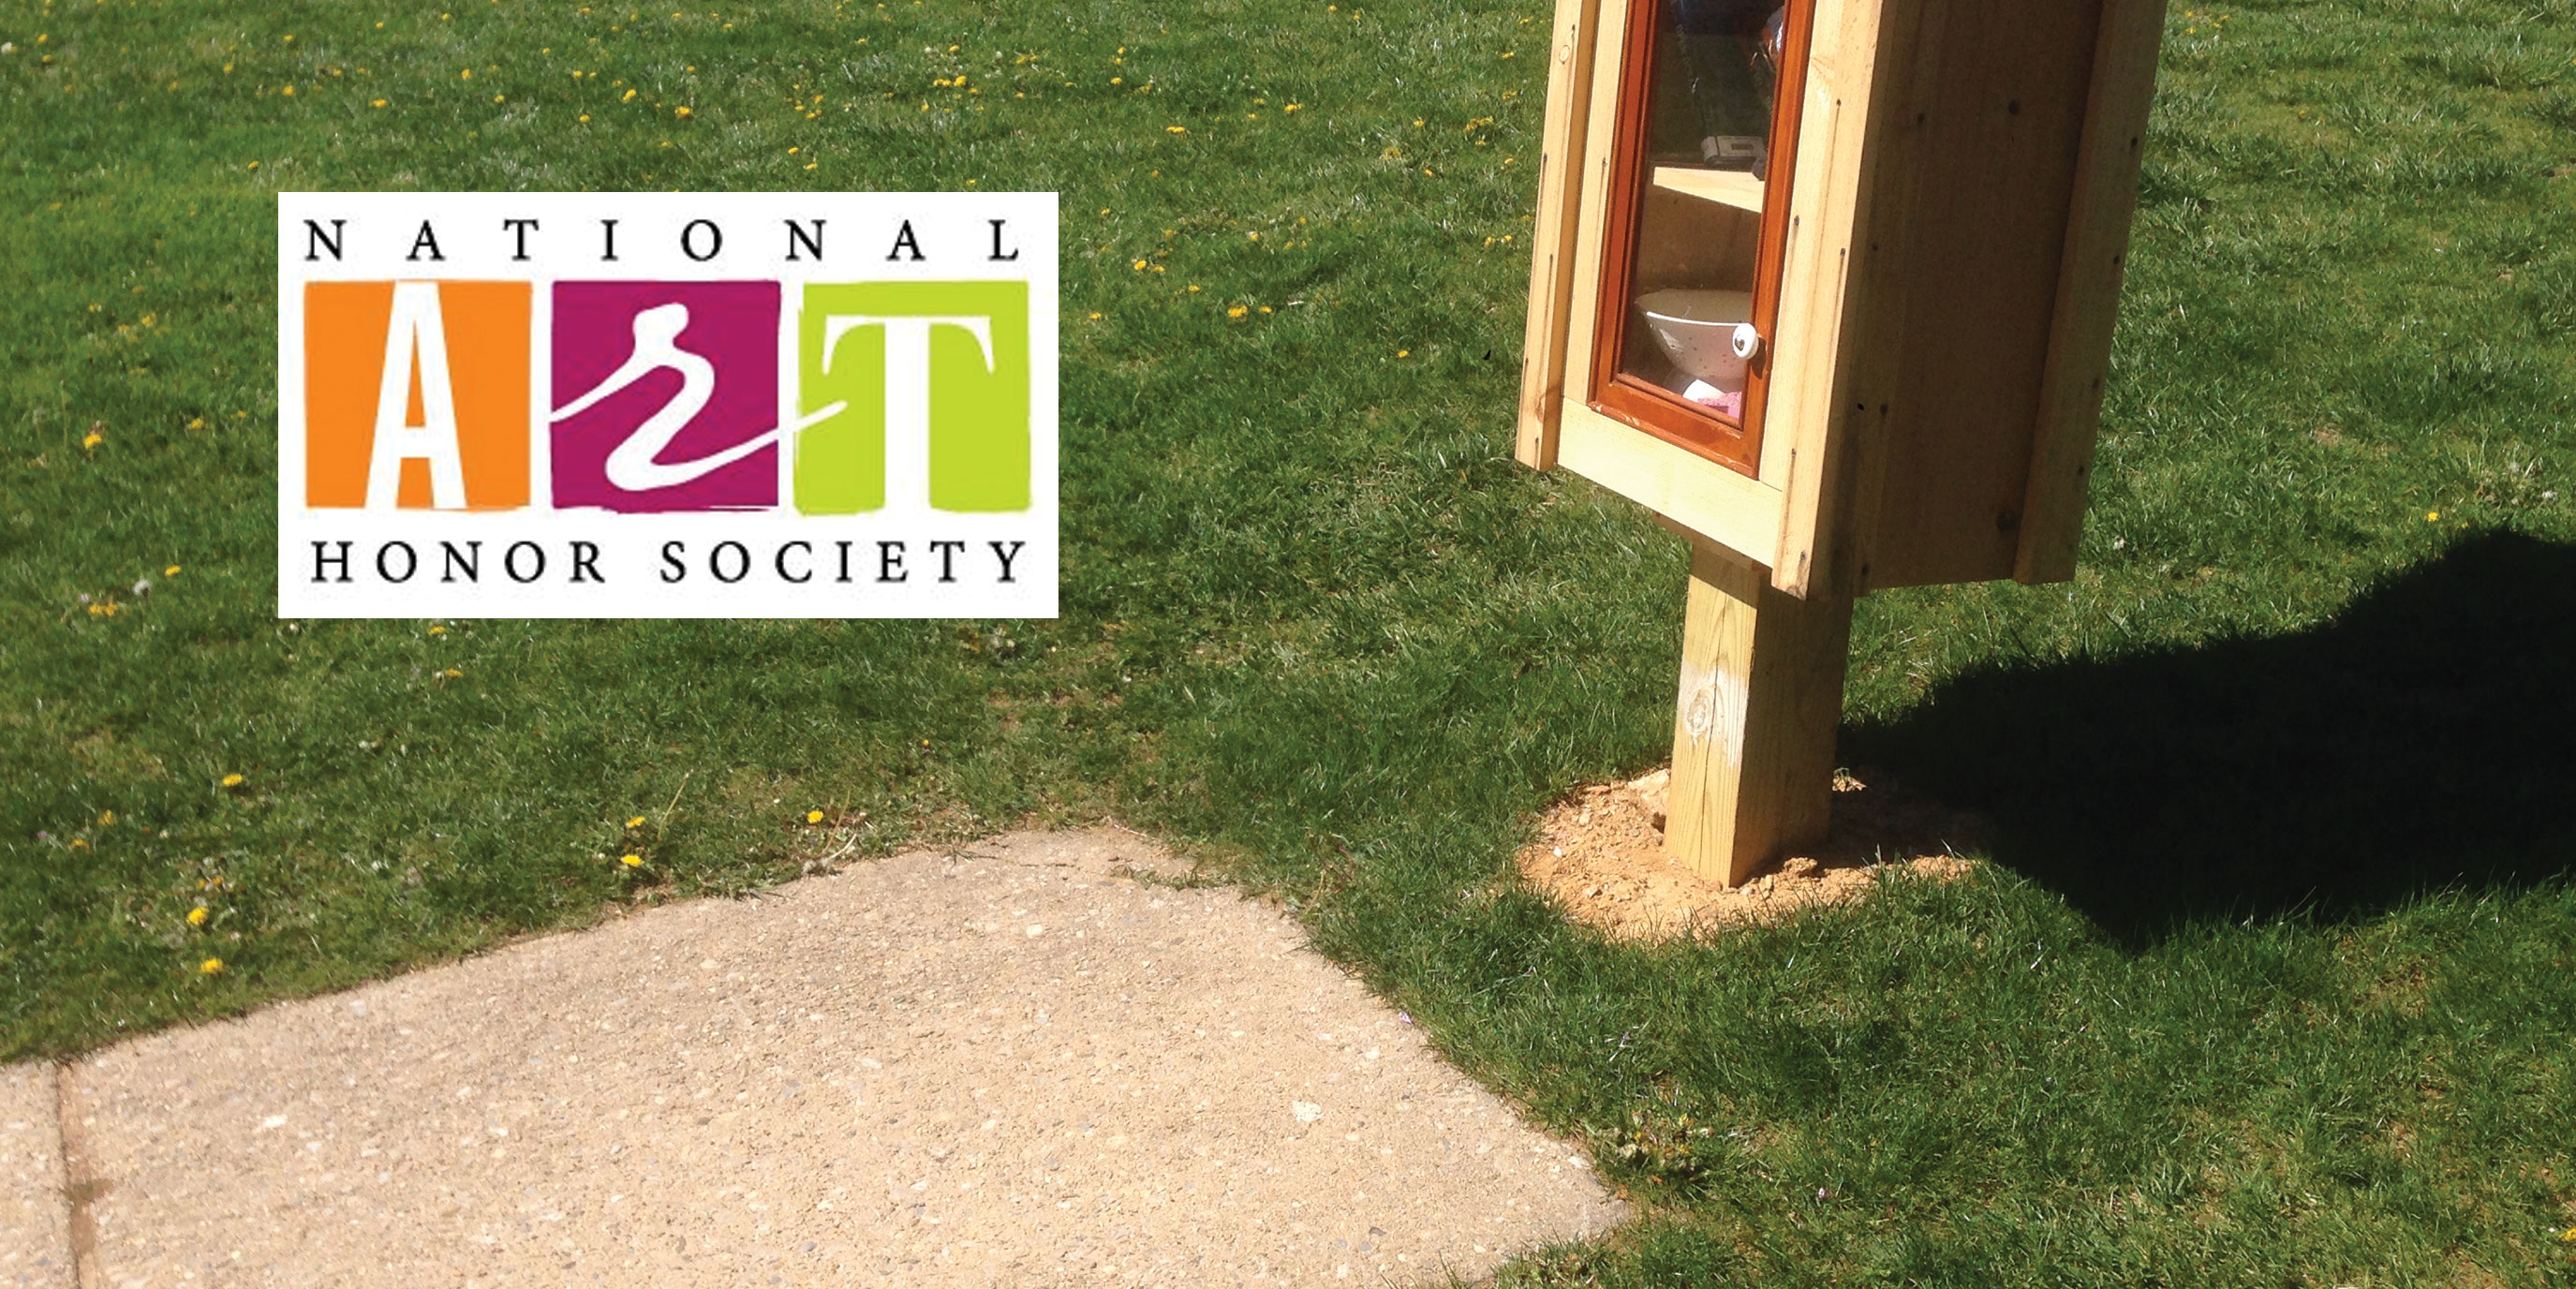 National Art Honor Society painting senior stone